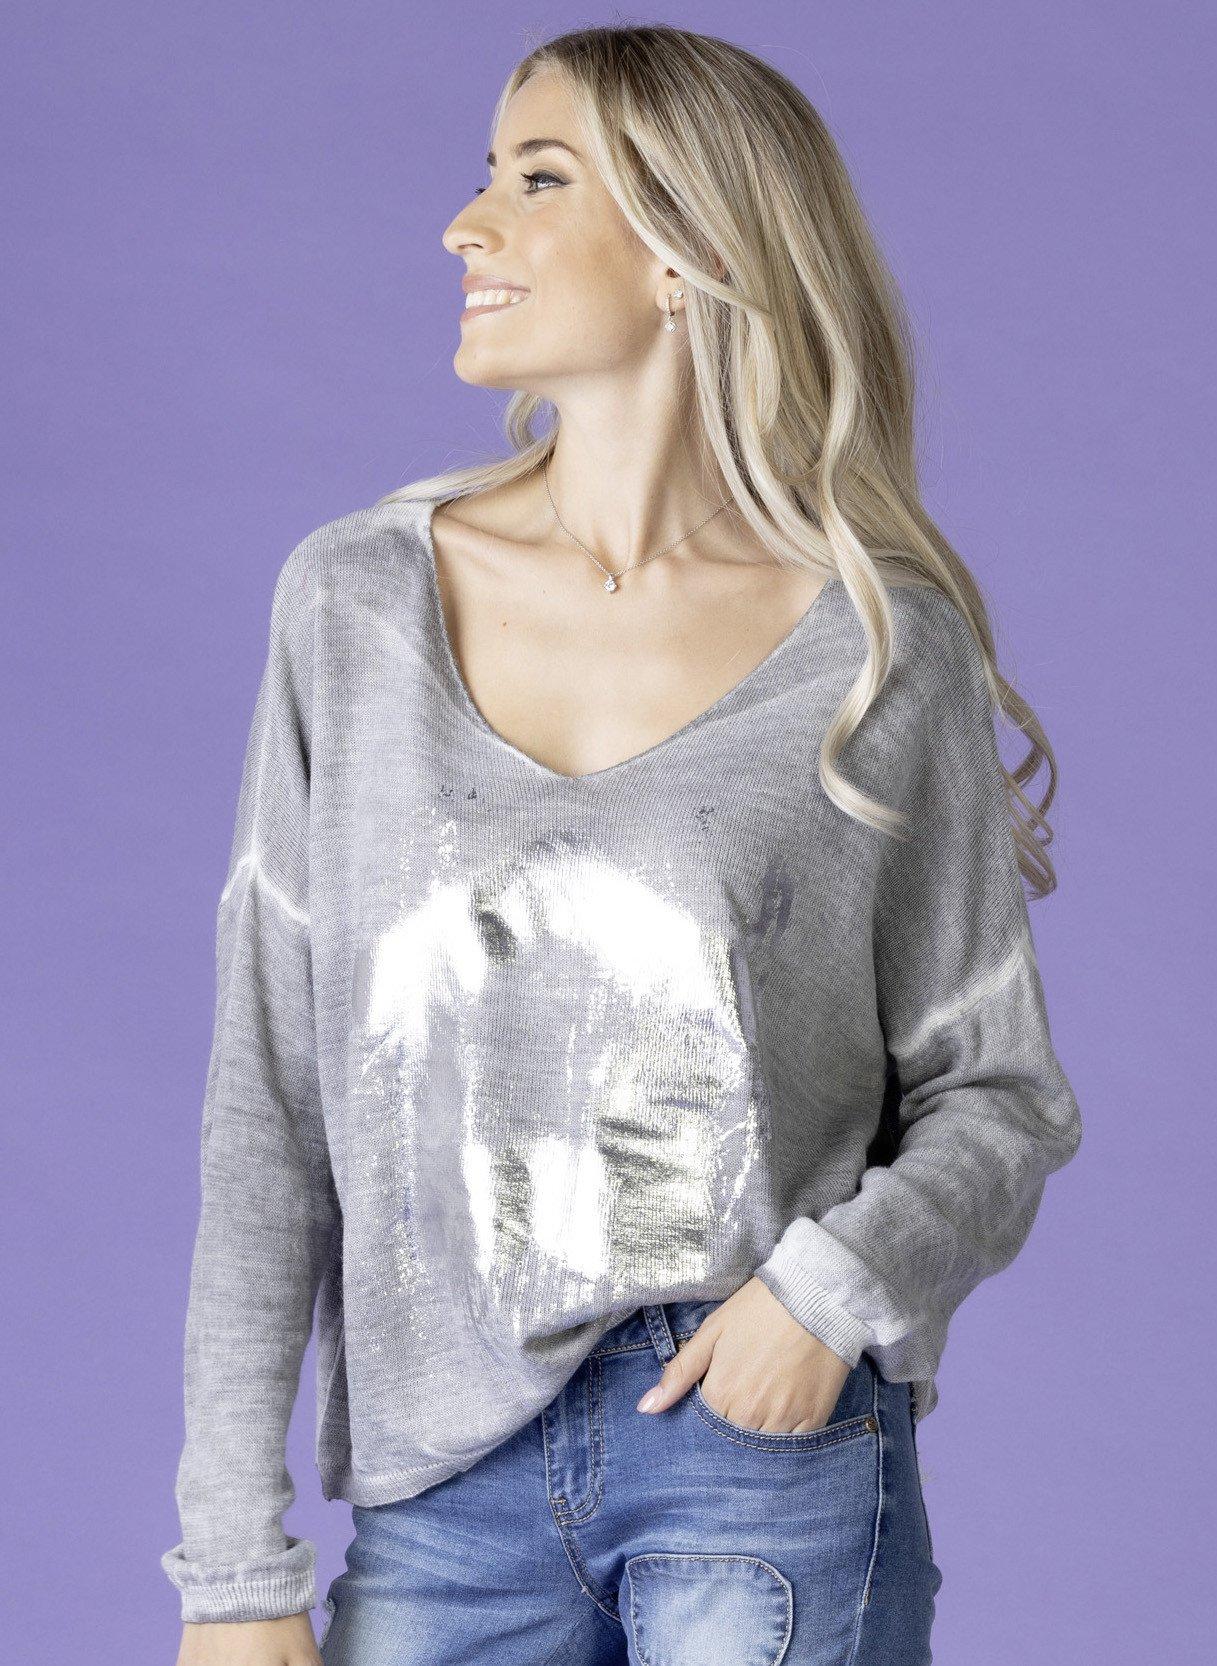 D-Pullover,Metalicprint silber L 007 - 1 - Ronja.ch